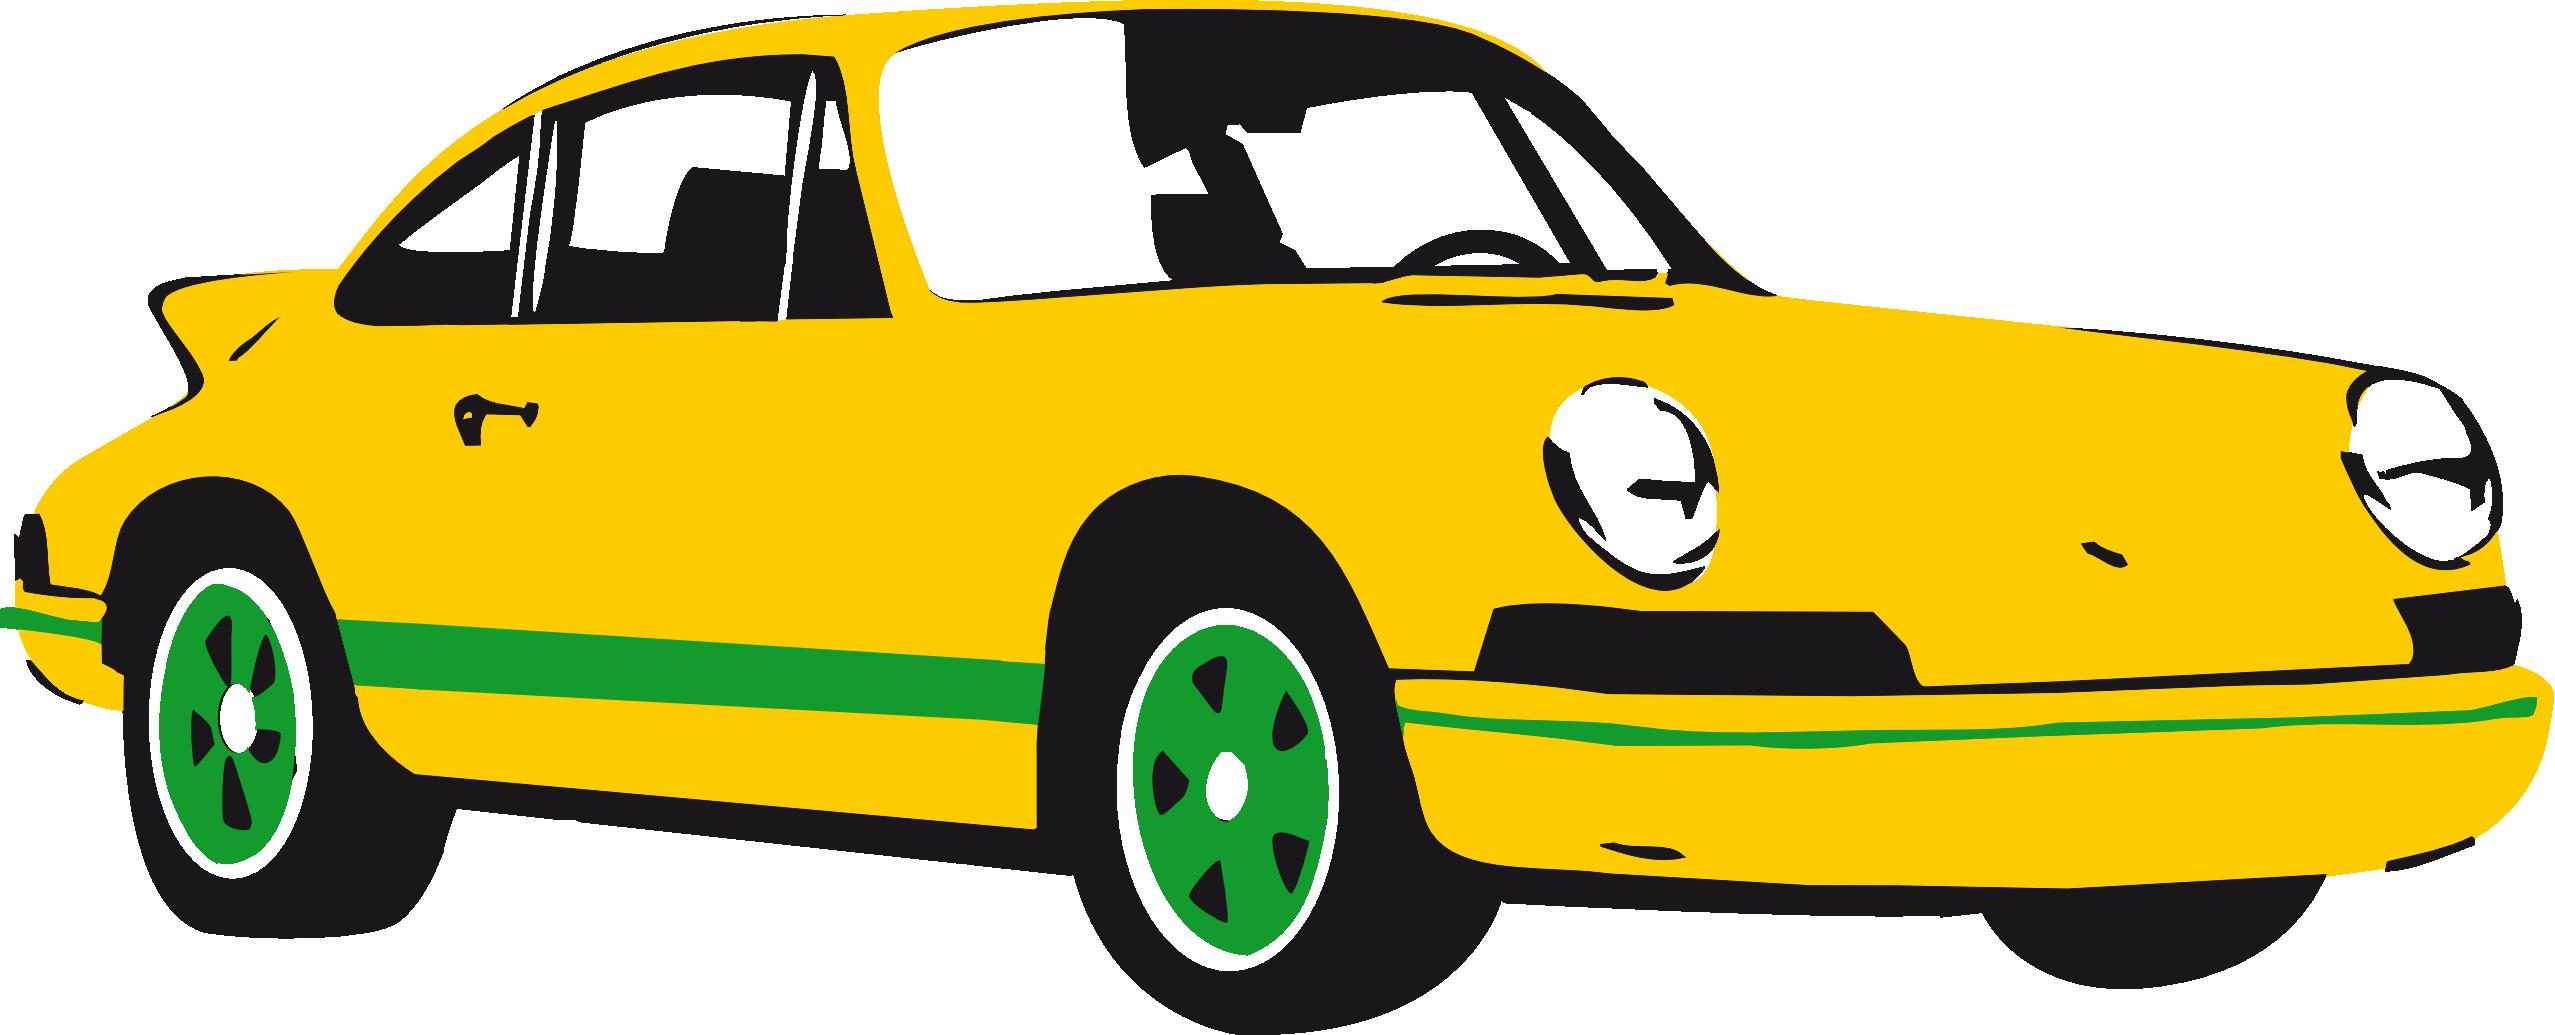 Free Race Car Clipart - Clipart Kid